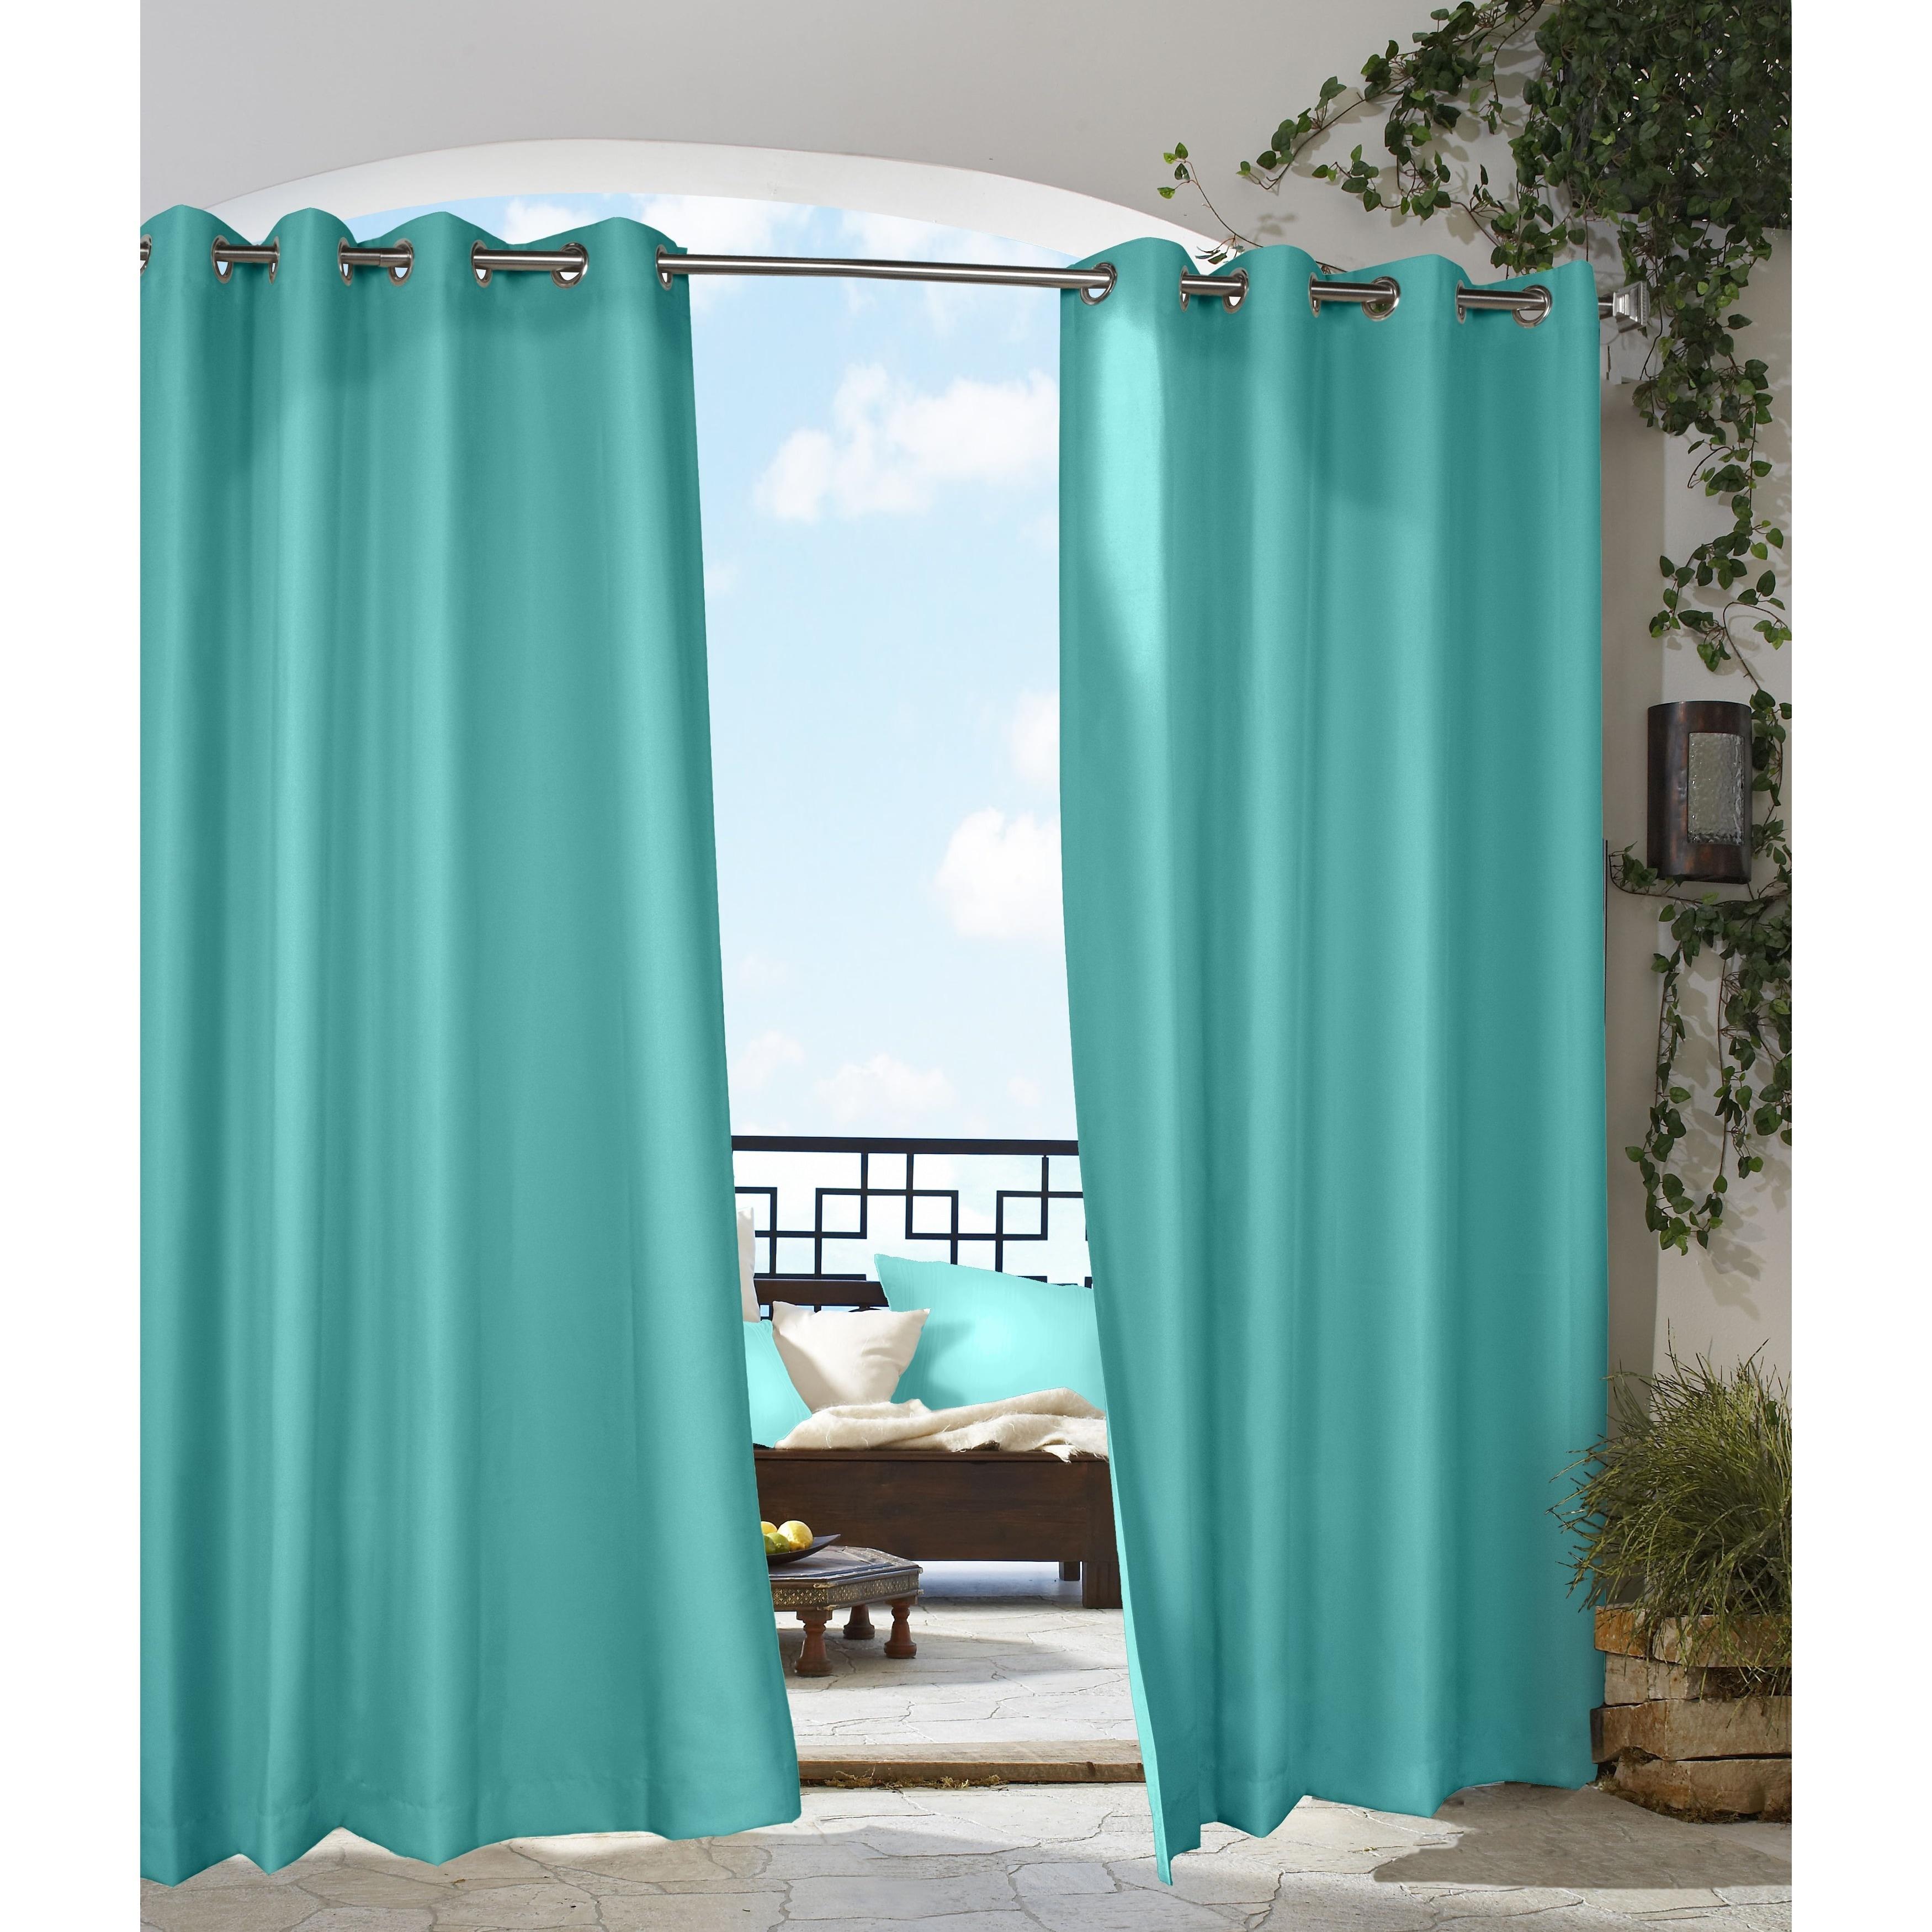 Gazebo Indoor/ Outdoor Grommet Top Curtain Panel - Free Shipping On Orders  Over $45 - Overstock.com - 14234349